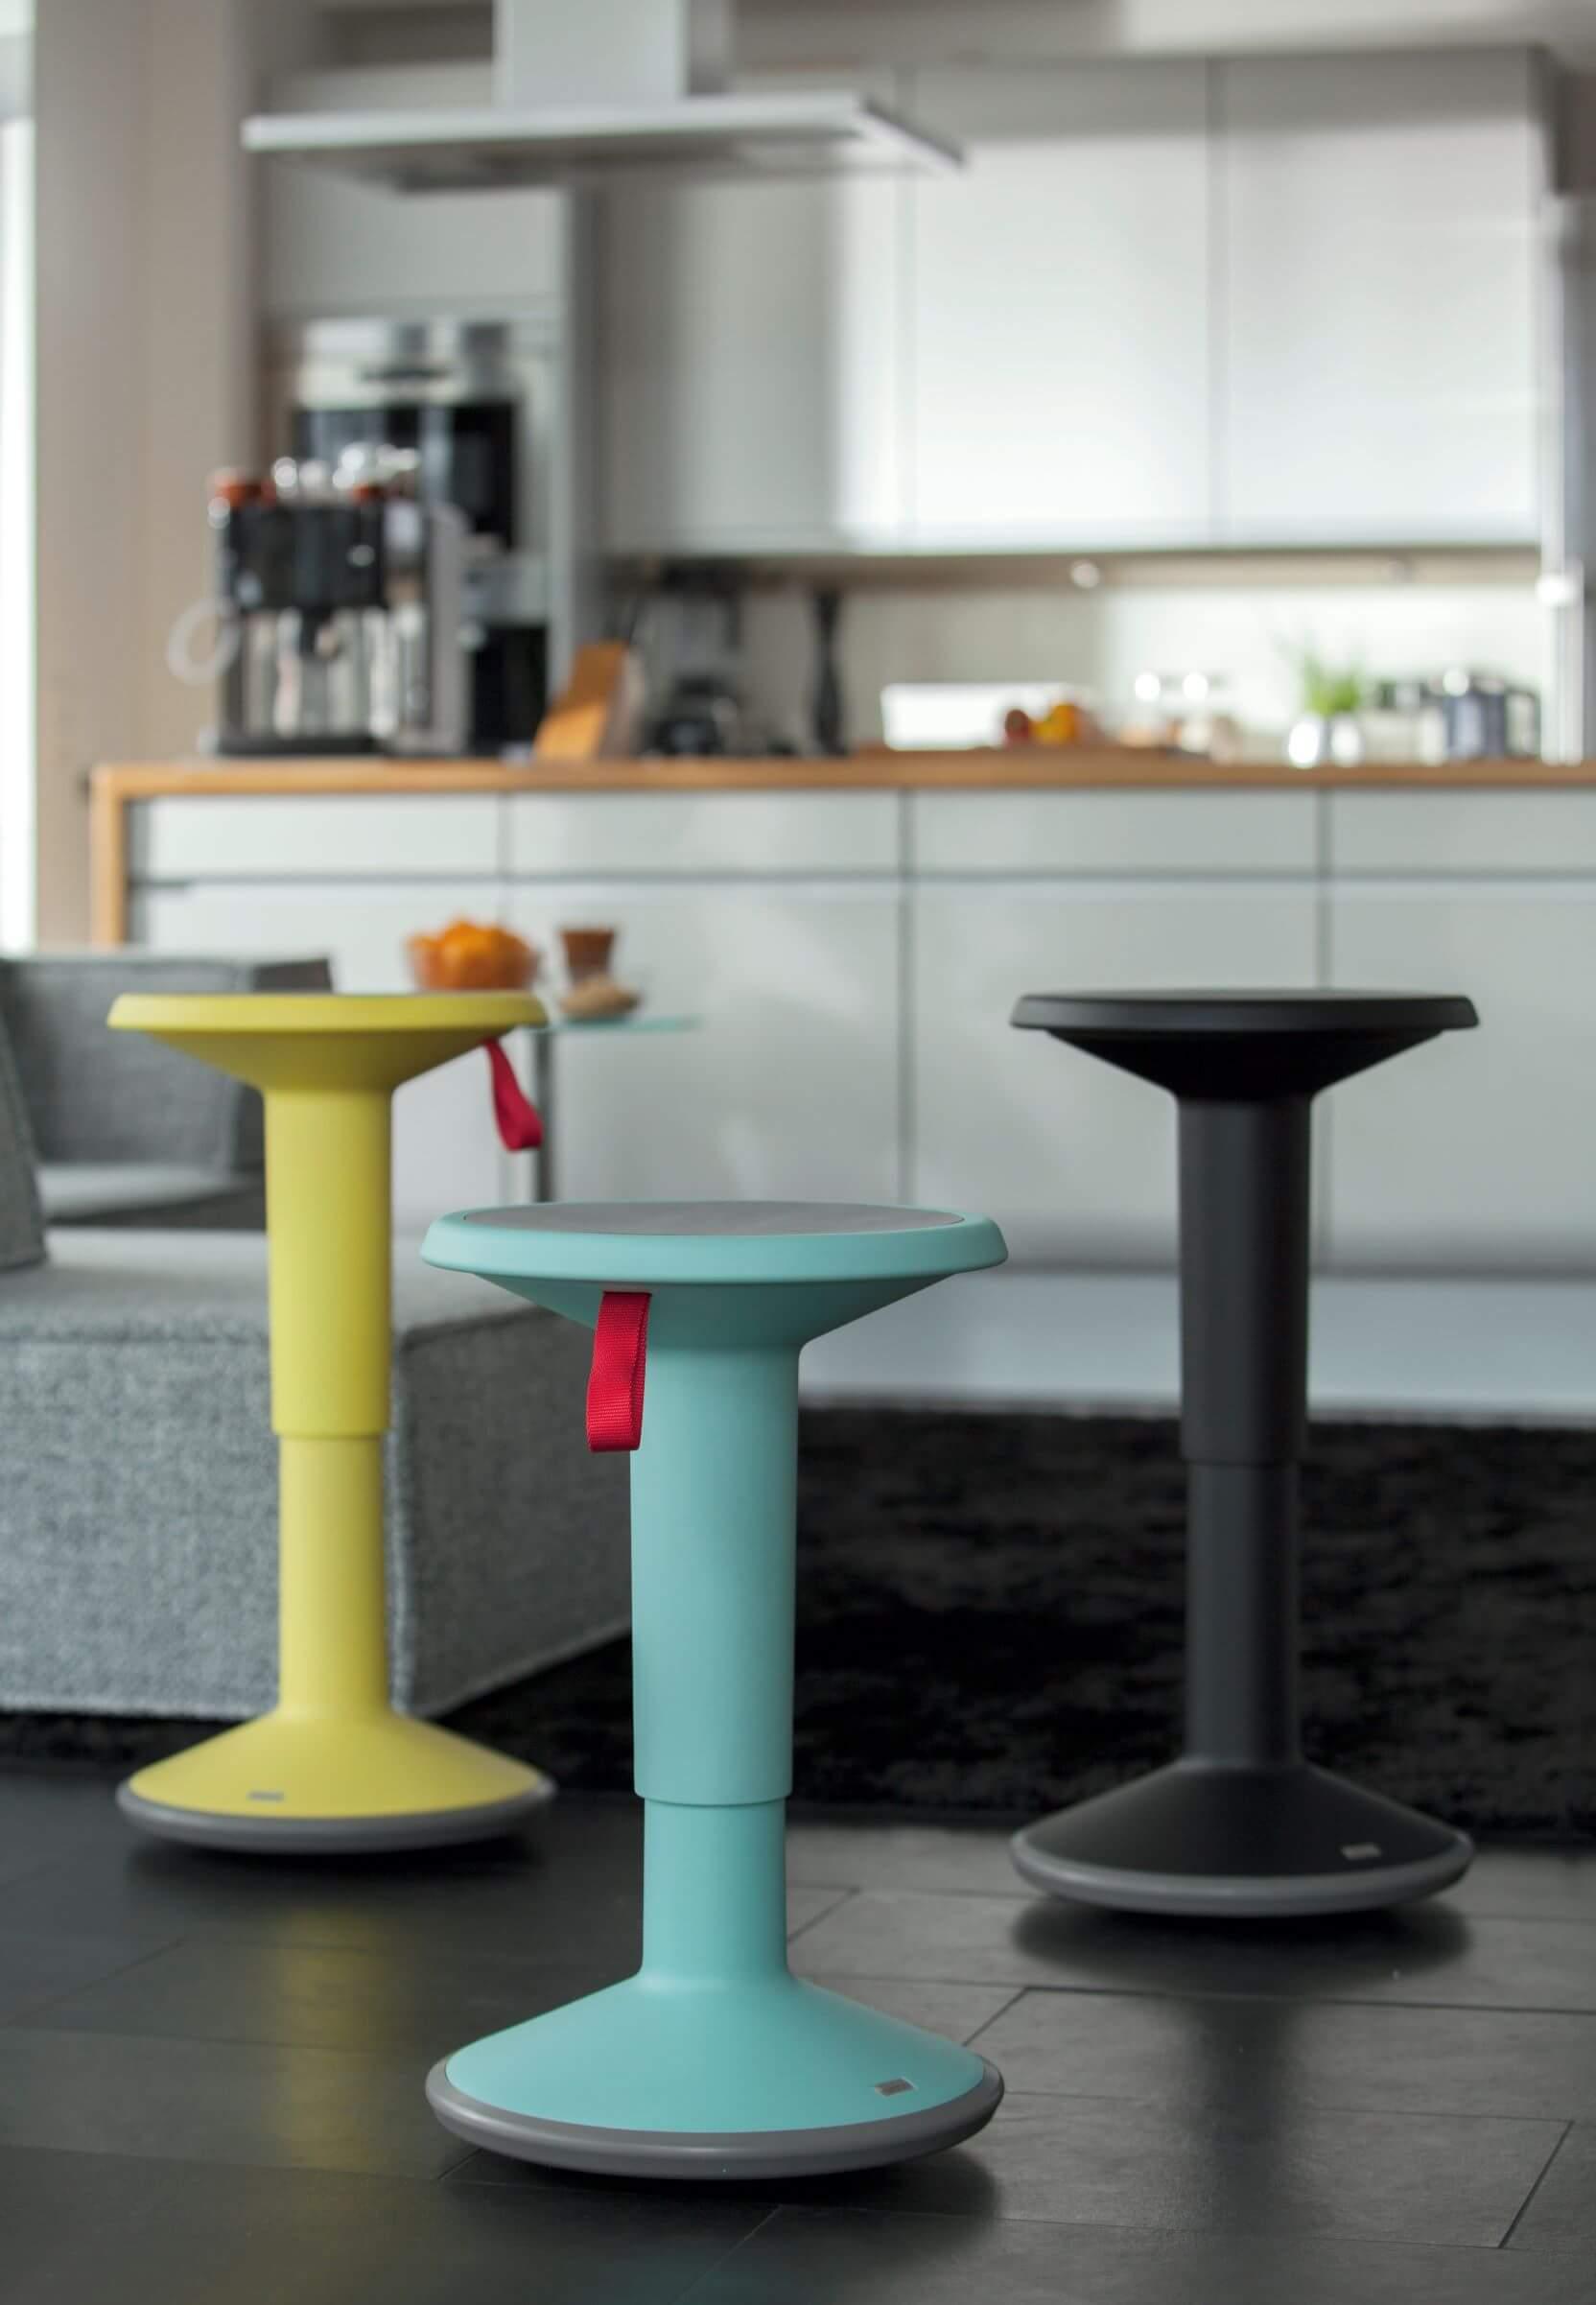 UPis1 Sidde-stå stol i glade farver